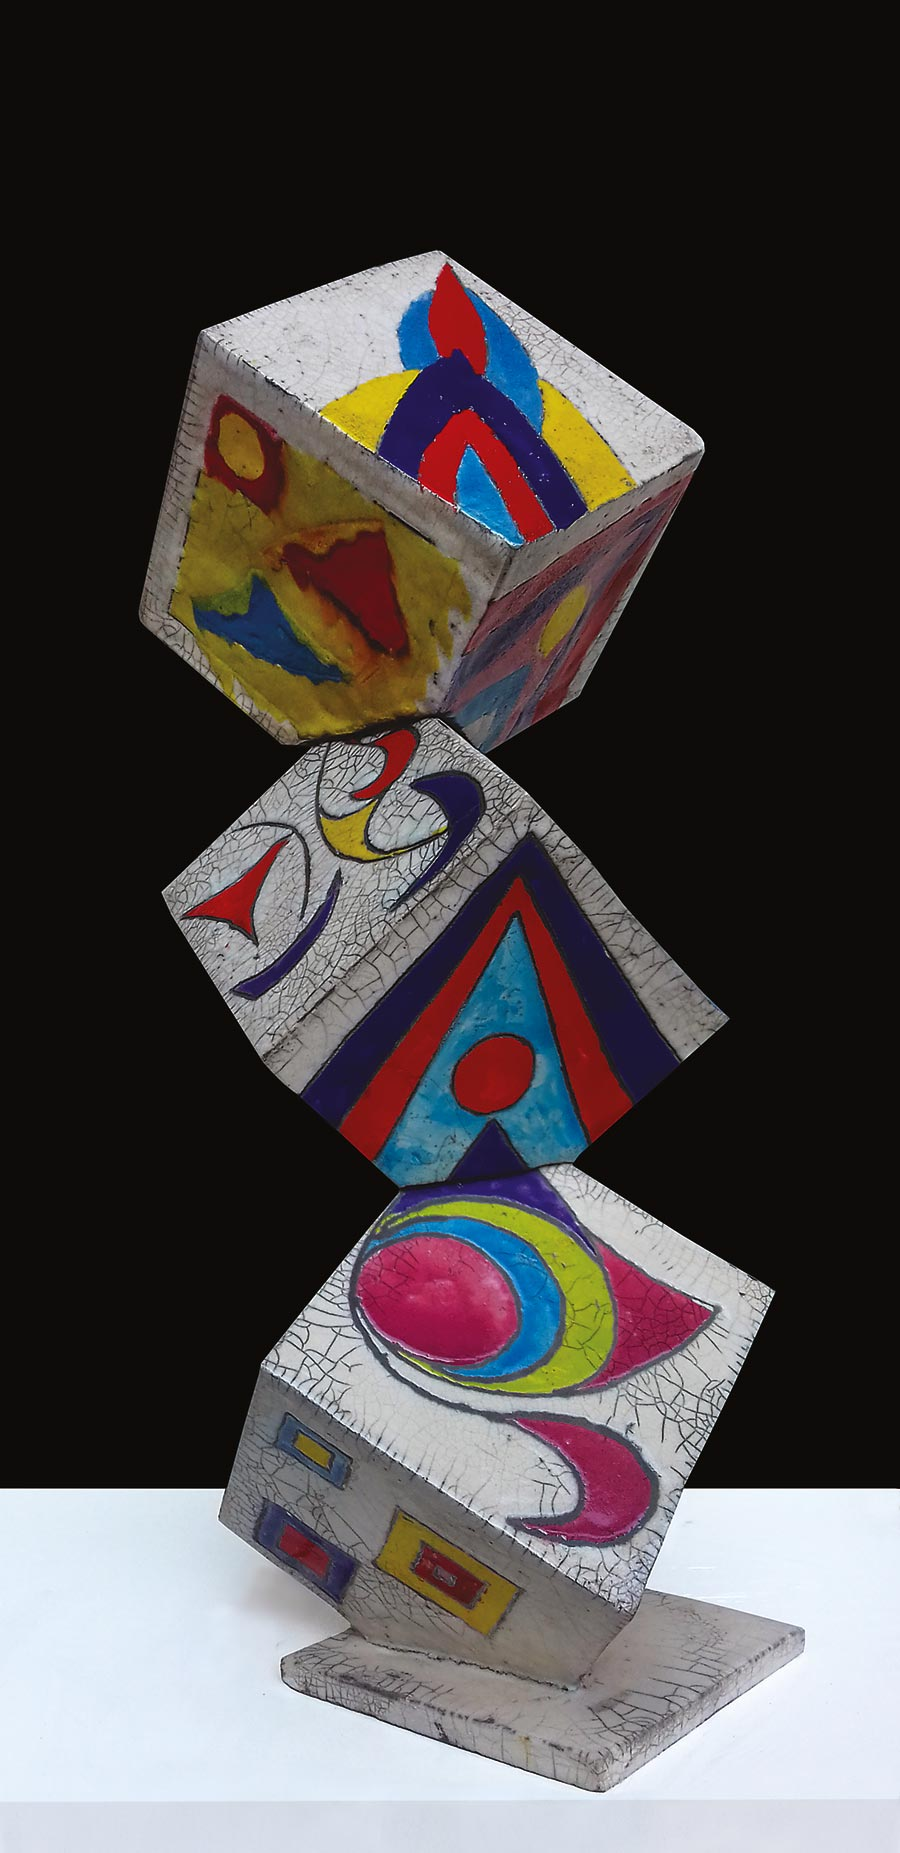 Cubi - Scultura